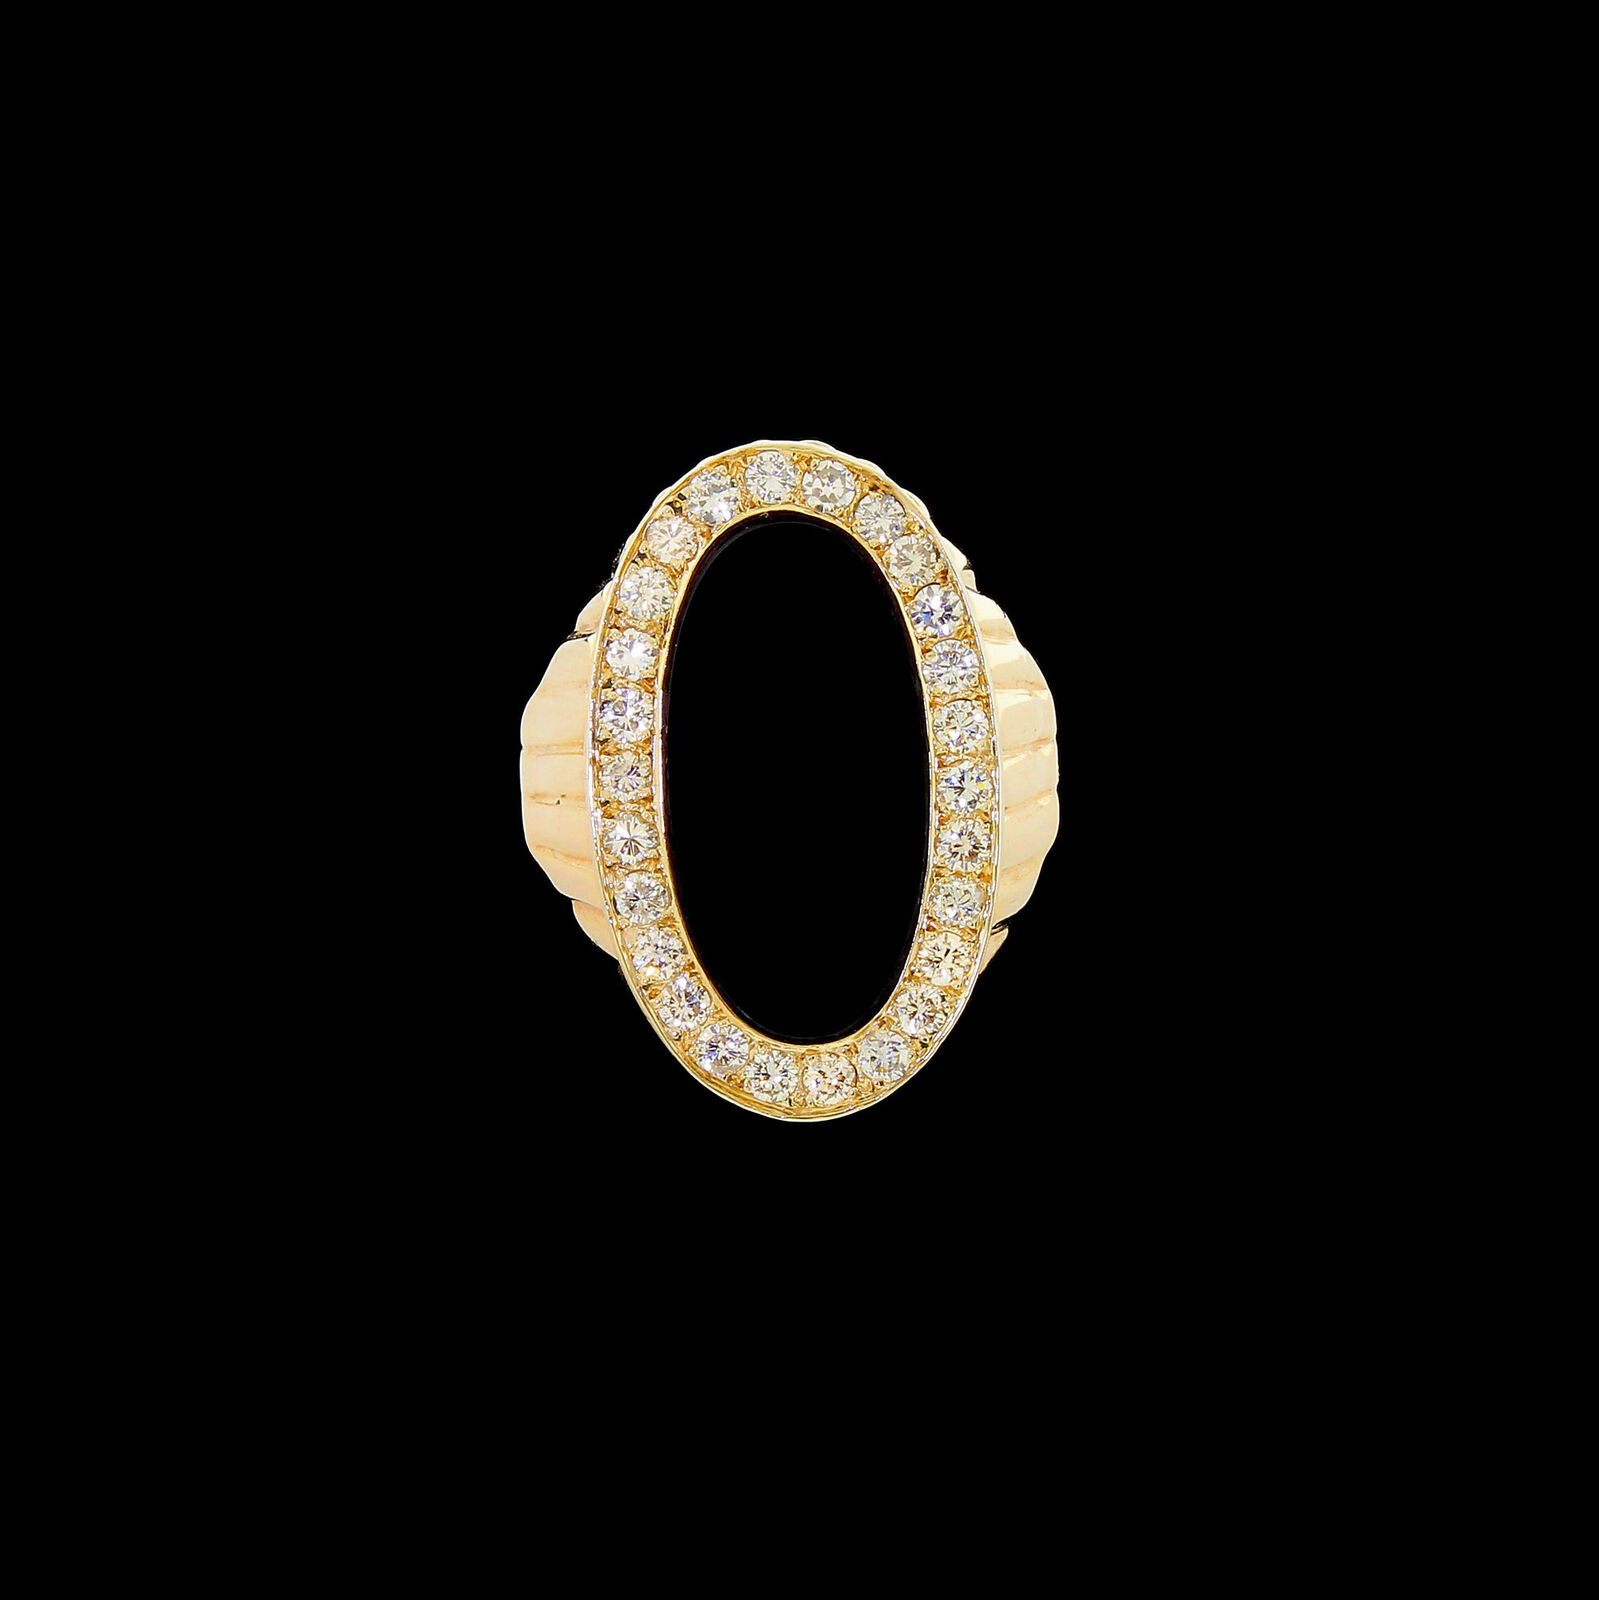 Vintage Men's 14k gold Large Onyx Diamond Ring Size 12 0.75 TCW Stunning Classy